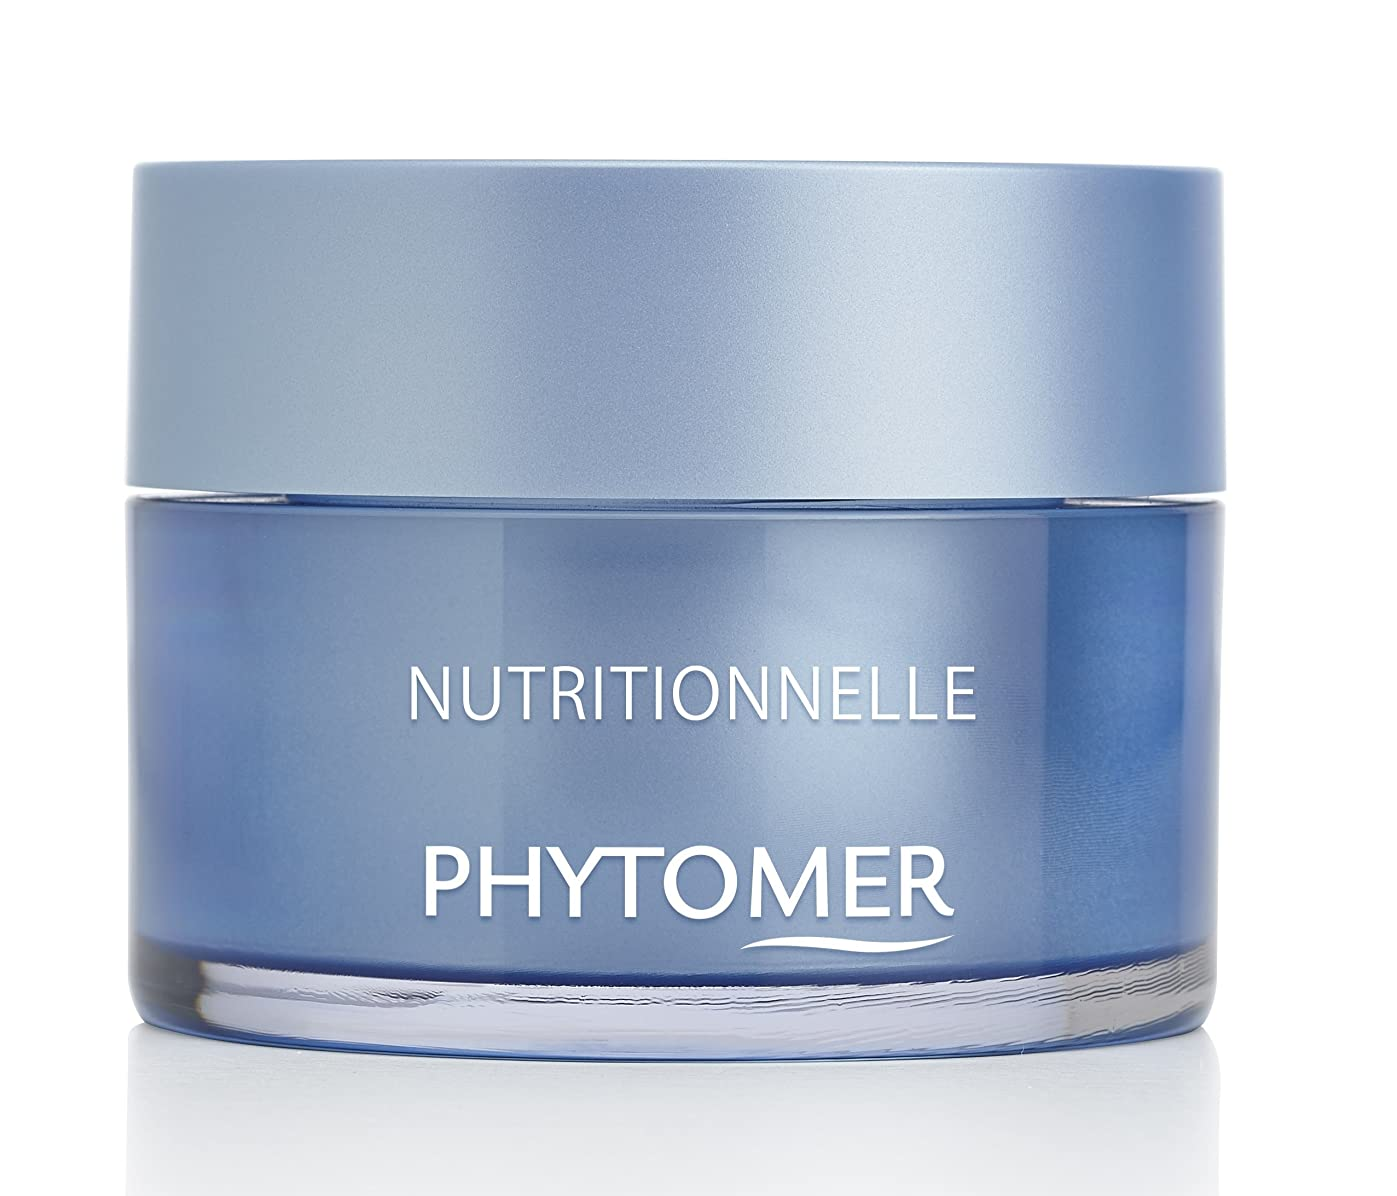 Phytomer Nutritionnelle Dry Skin Rescue Cream 50ml並行輸入品